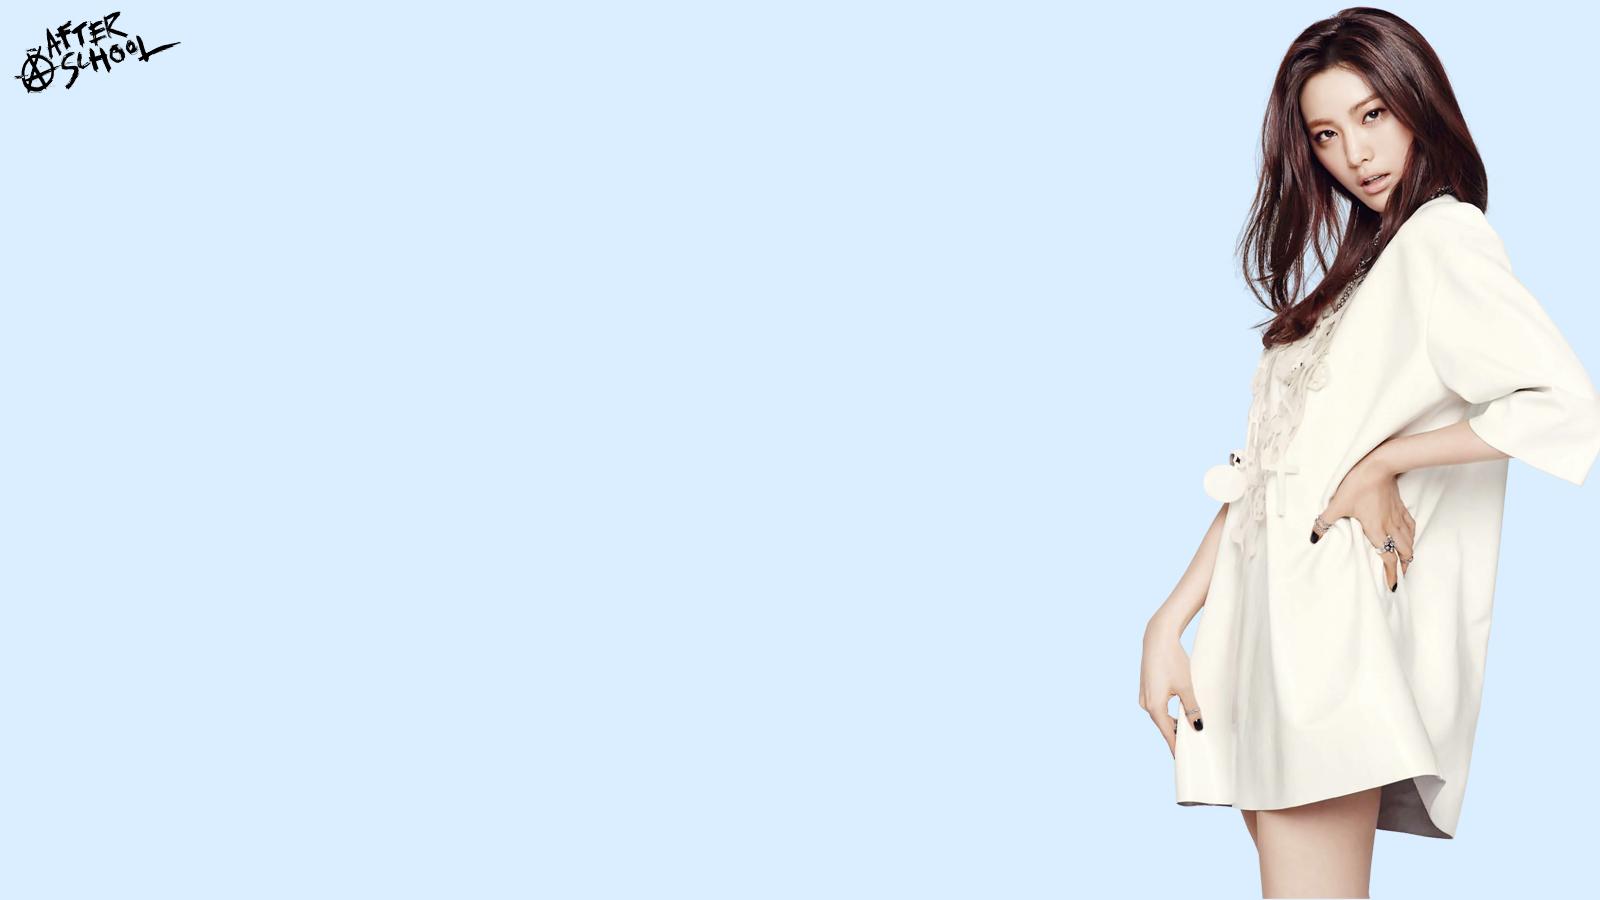 Download Nana After School Wallpaper Gallery 1600x900